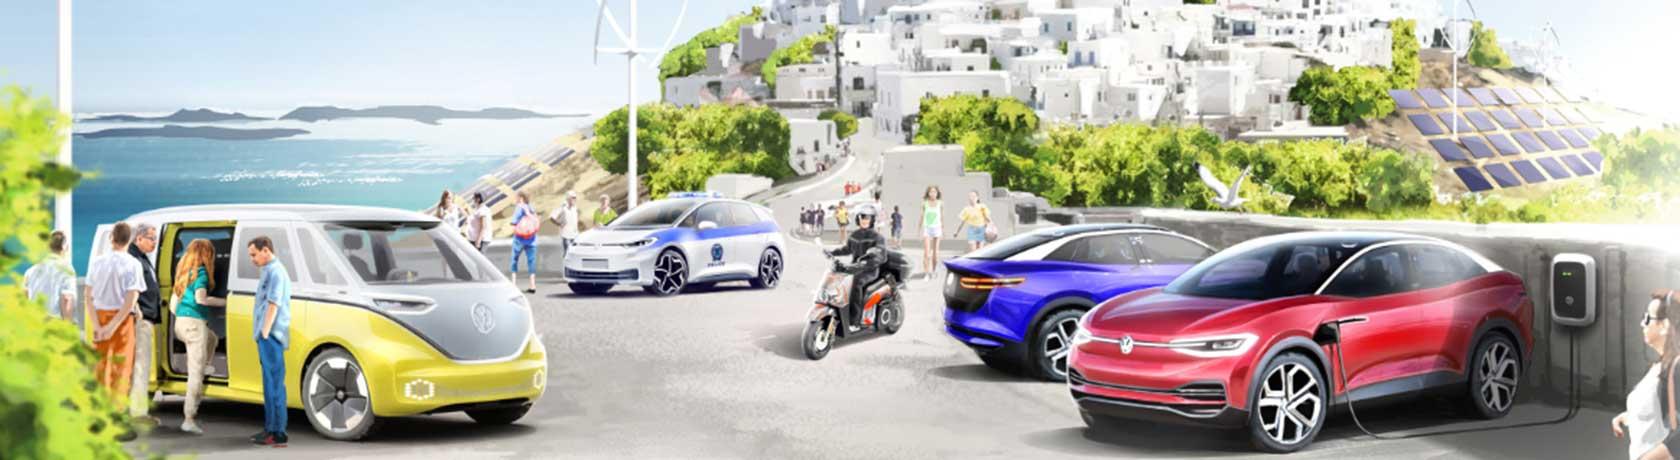 Volkswagen e Stampalia